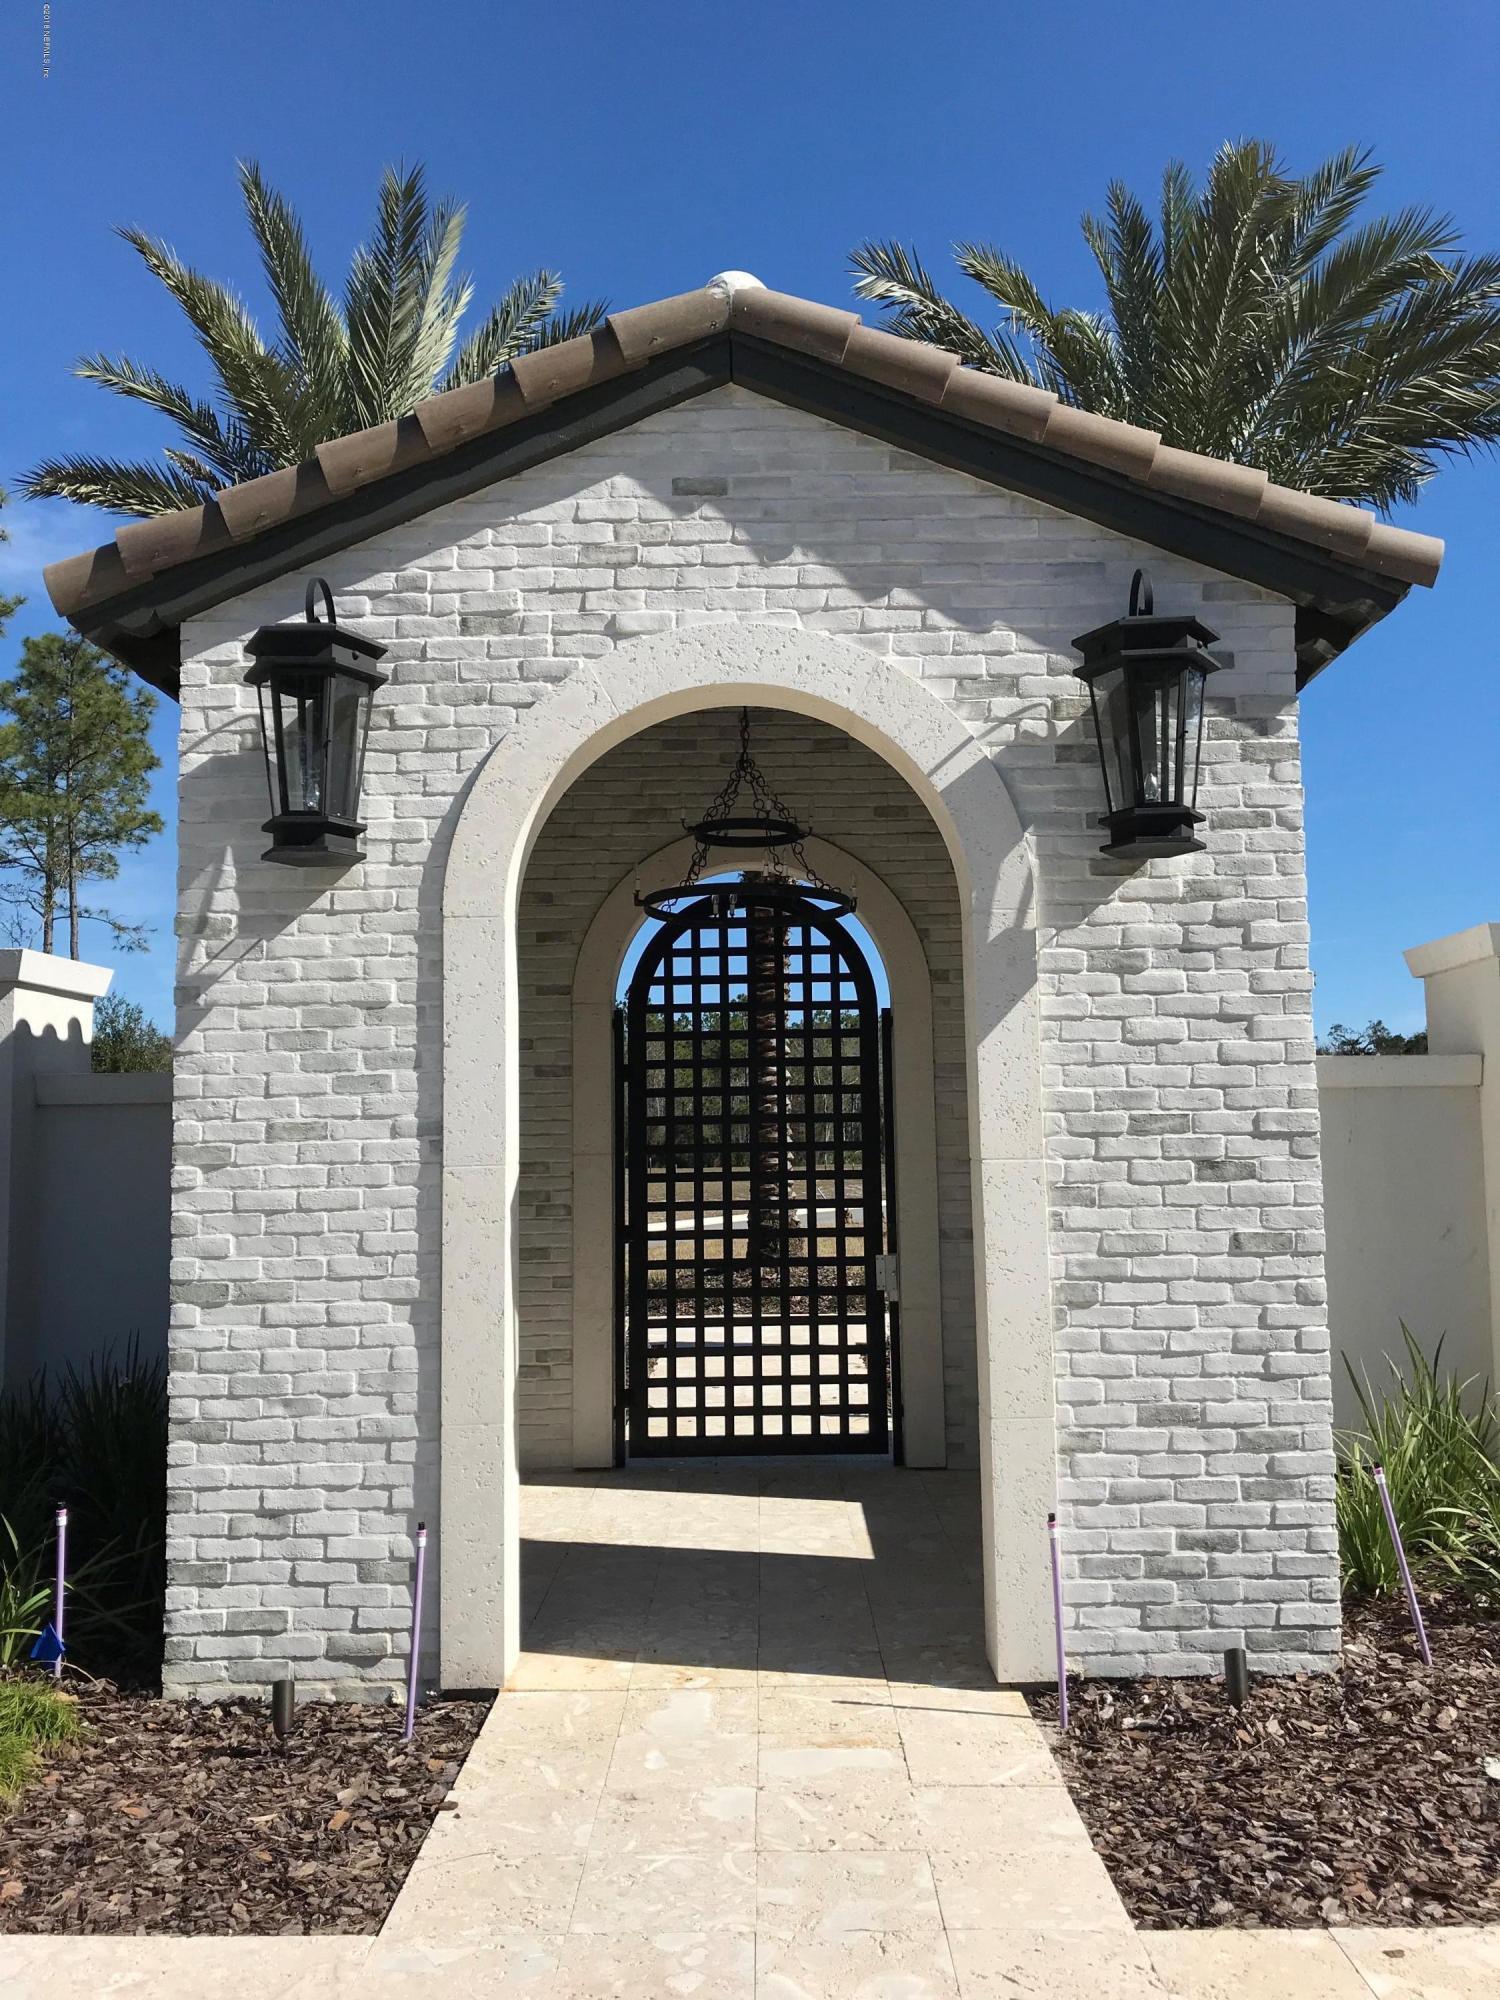 329 WILDERNESS RIDGE, PONTE VEDRA, FLORIDA 32081, ,Vacant land,For sale,WILDERNESS RIDGE,921076